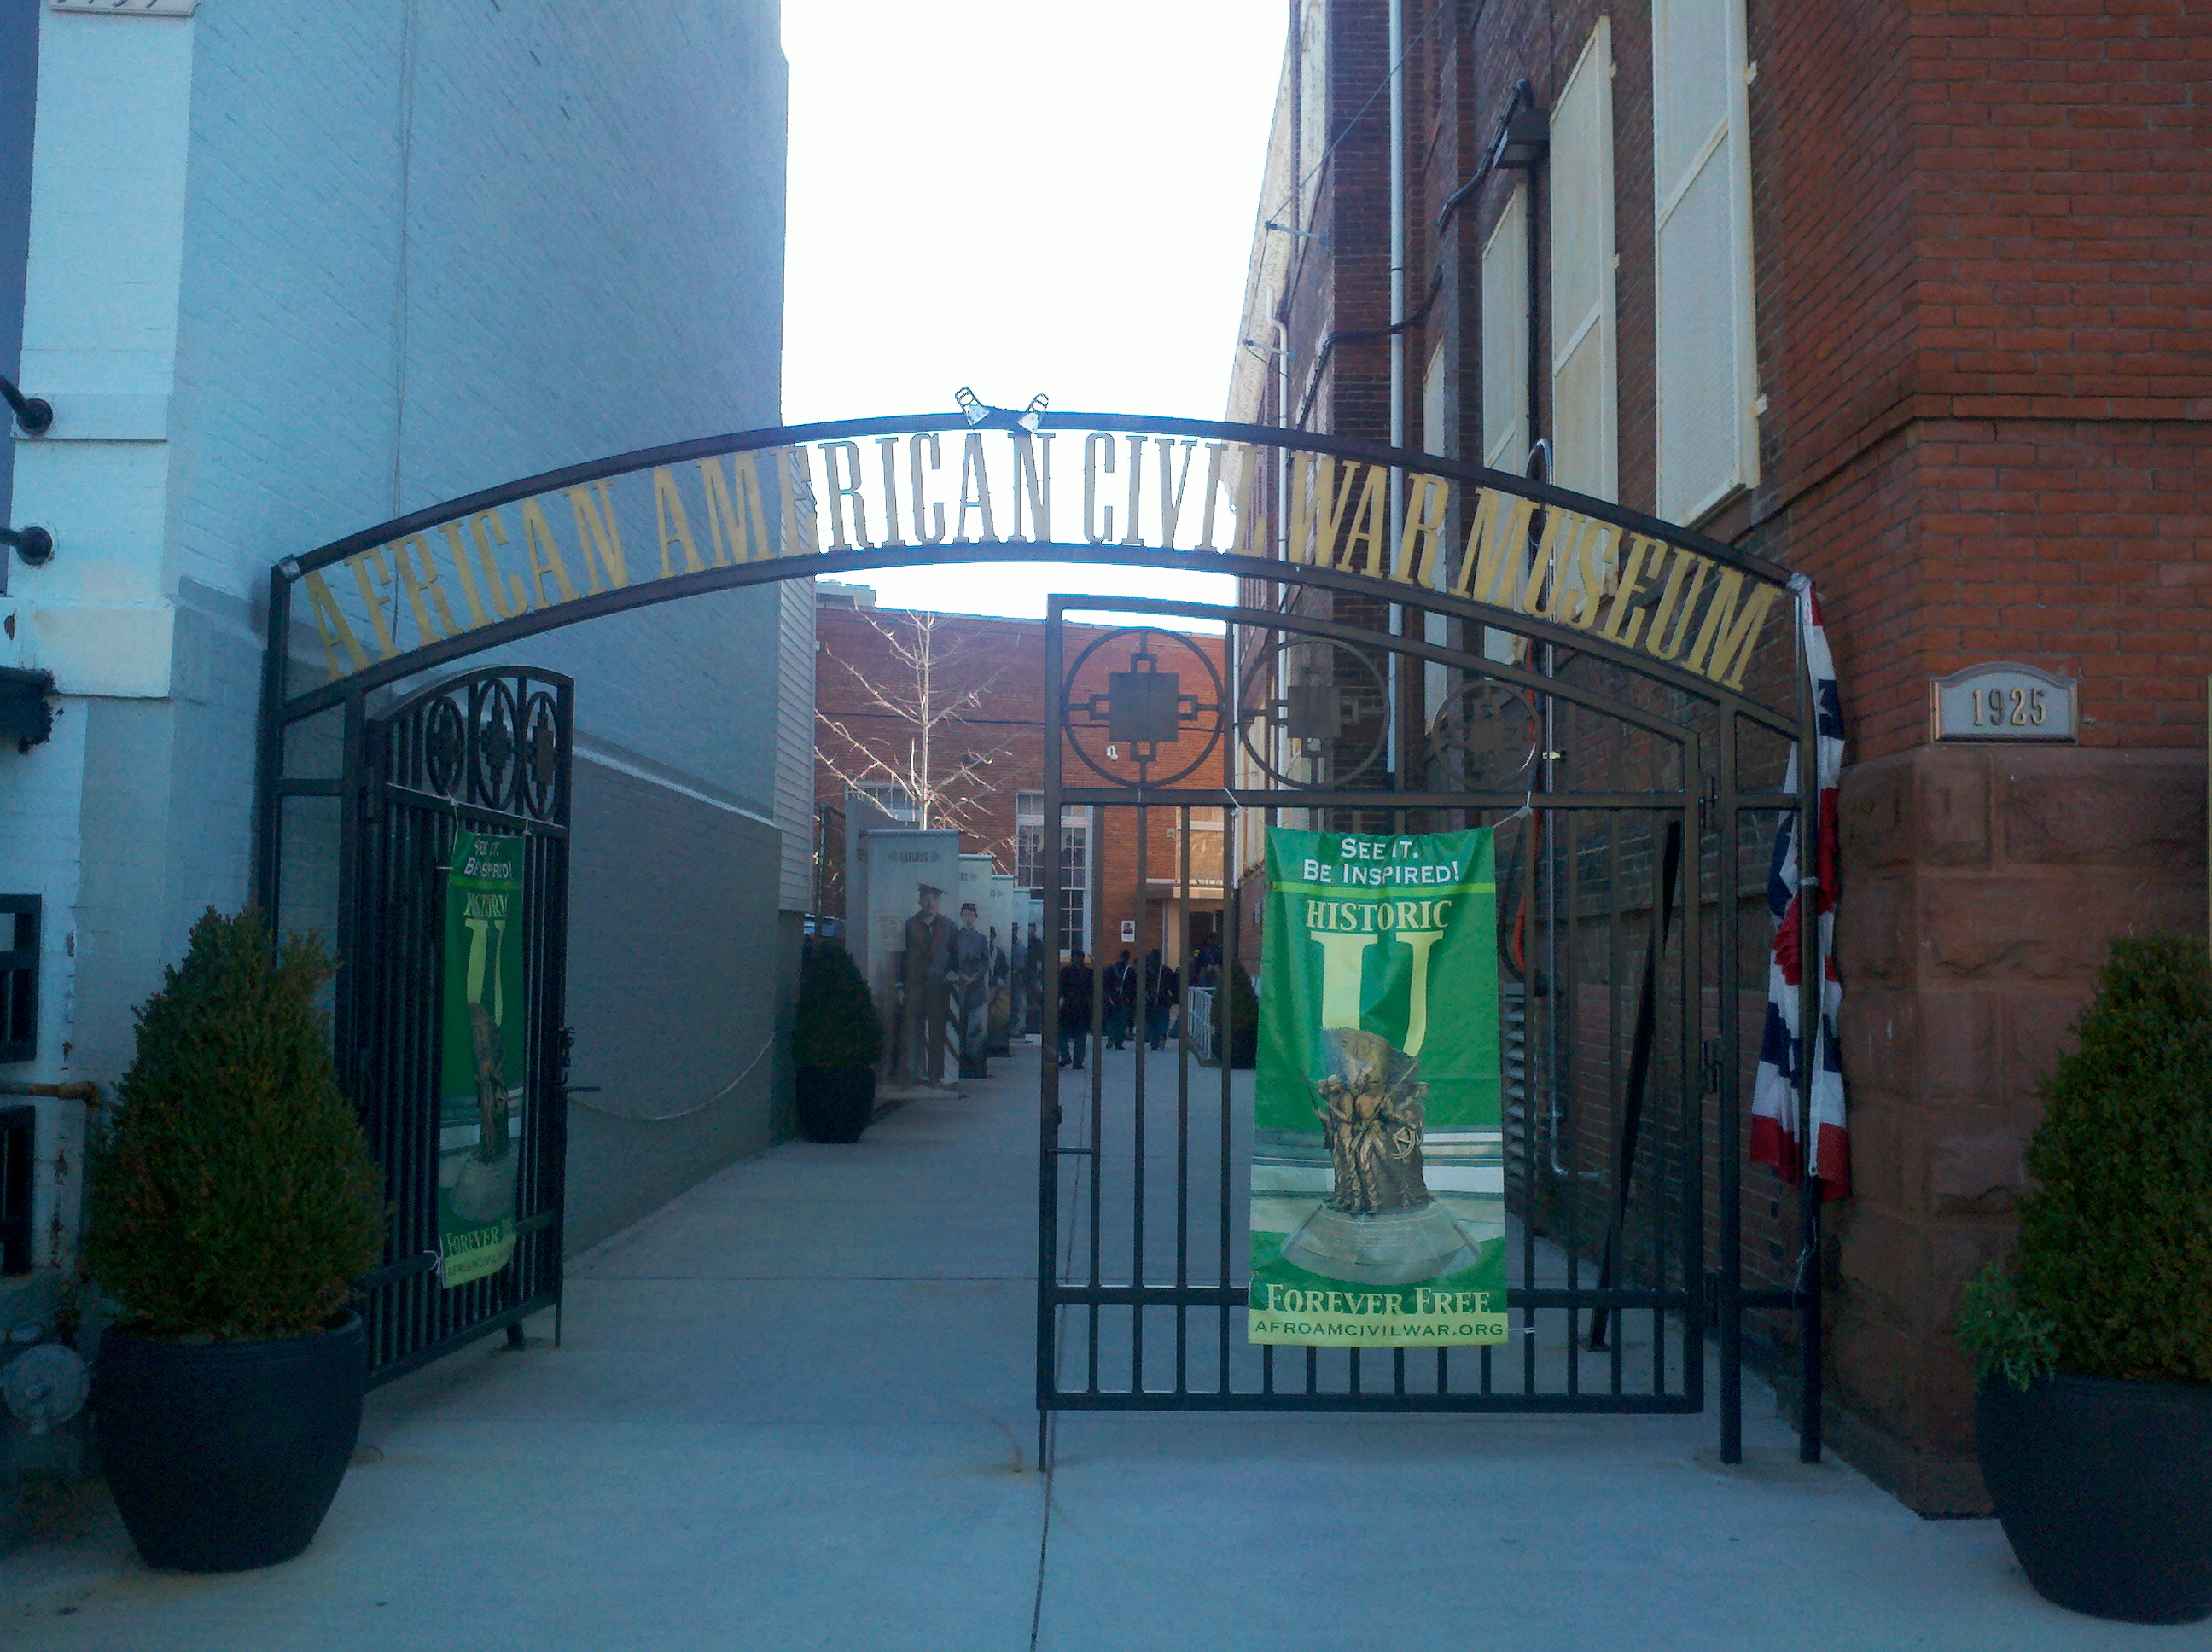 African American Civil War Museum Entrance Gate.